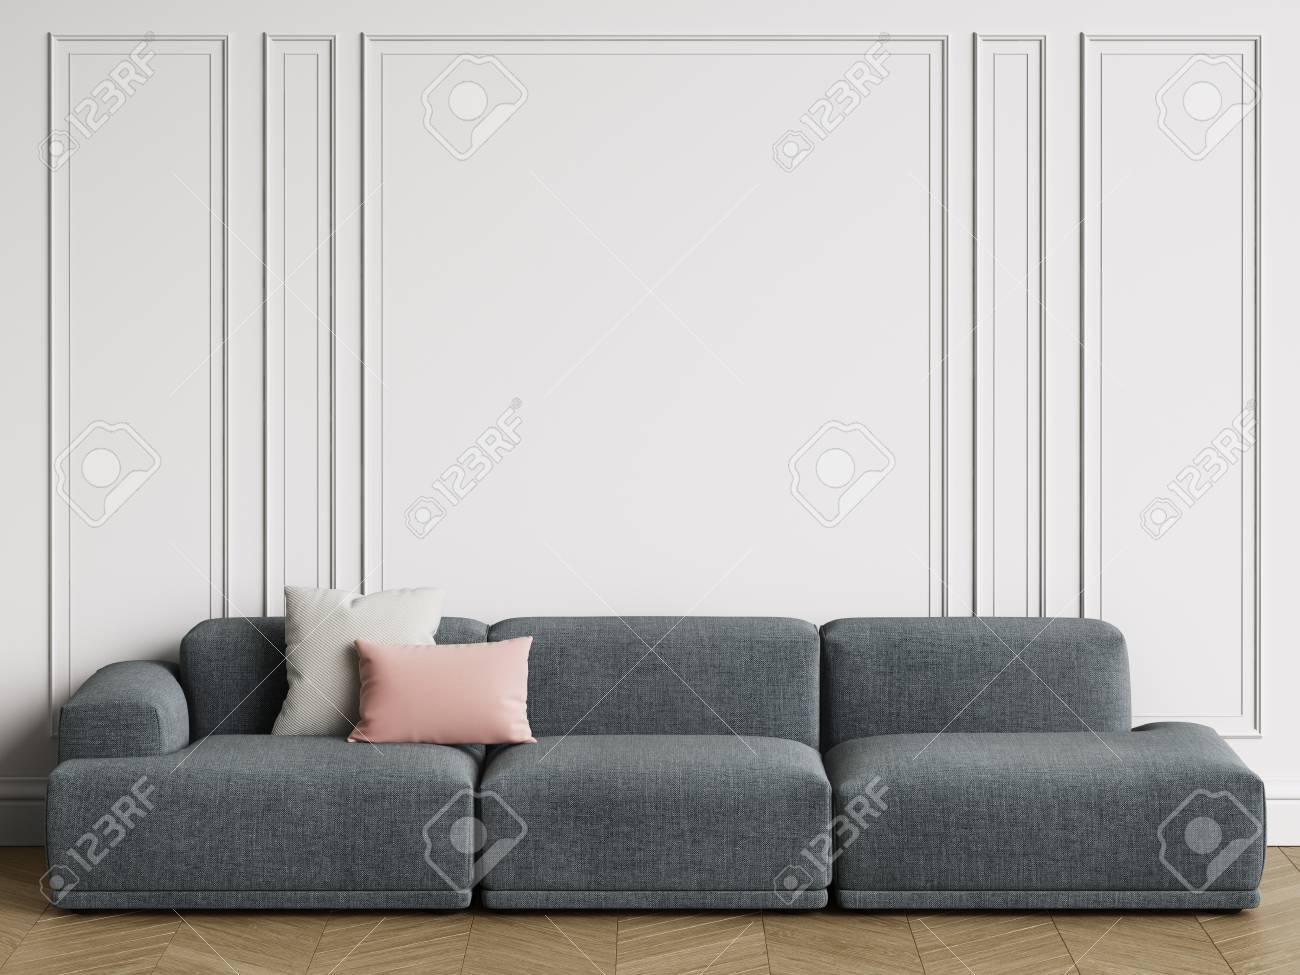 scandinavian design sofa – Home Decor 88